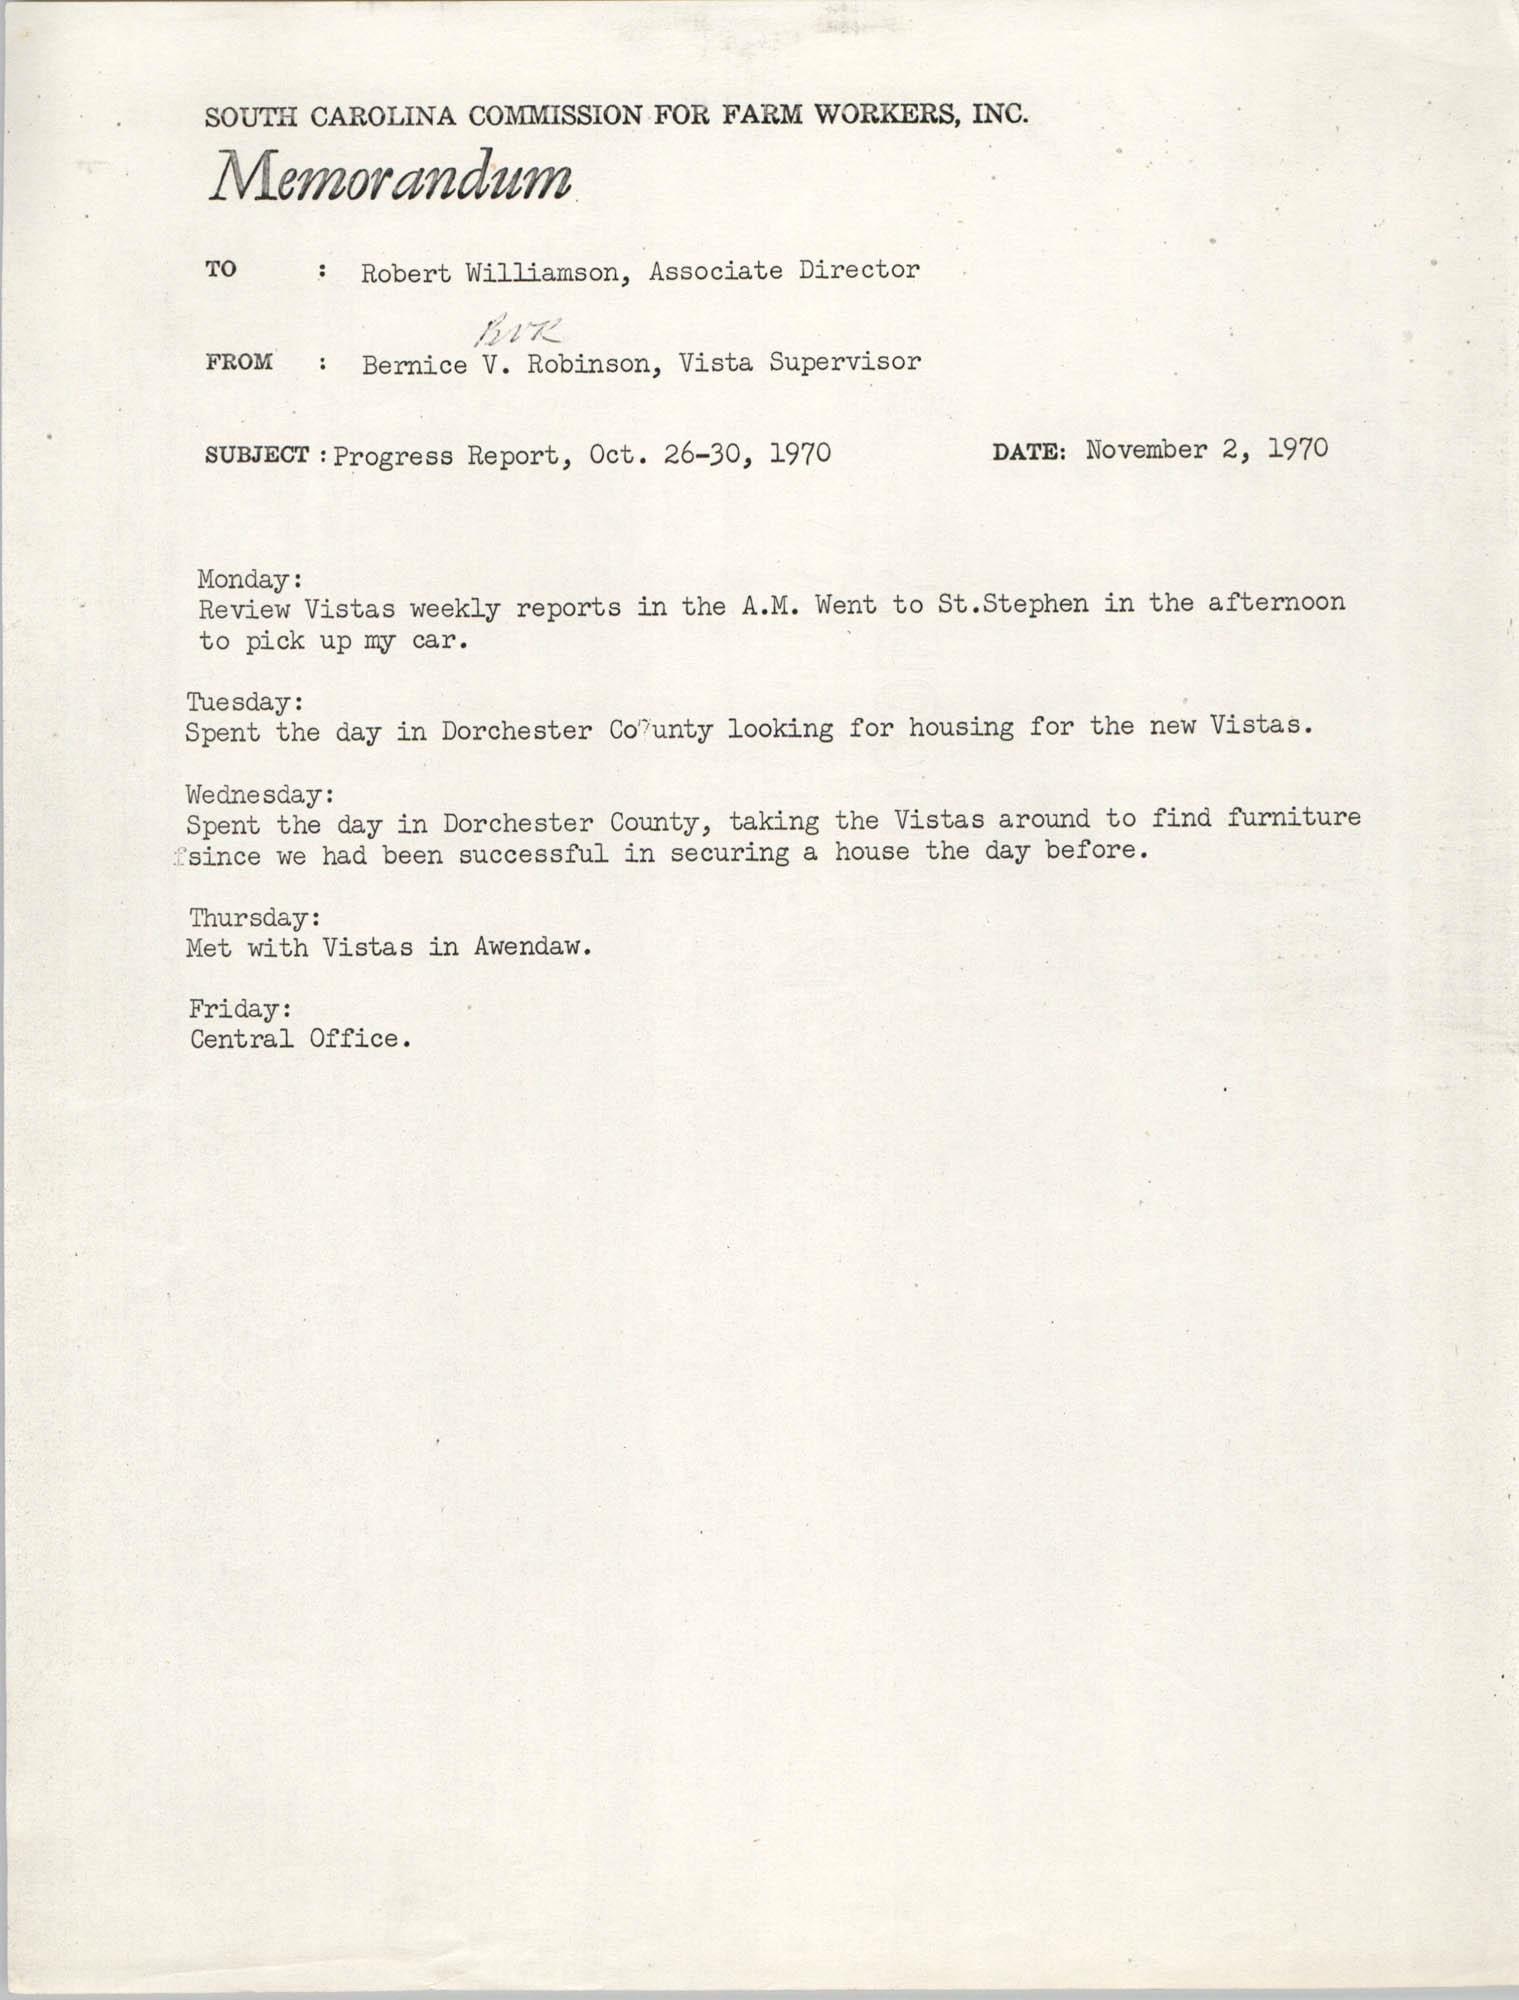 Memorandum from Bernice V. Robinson to Robert Williamson, November 2, 1970